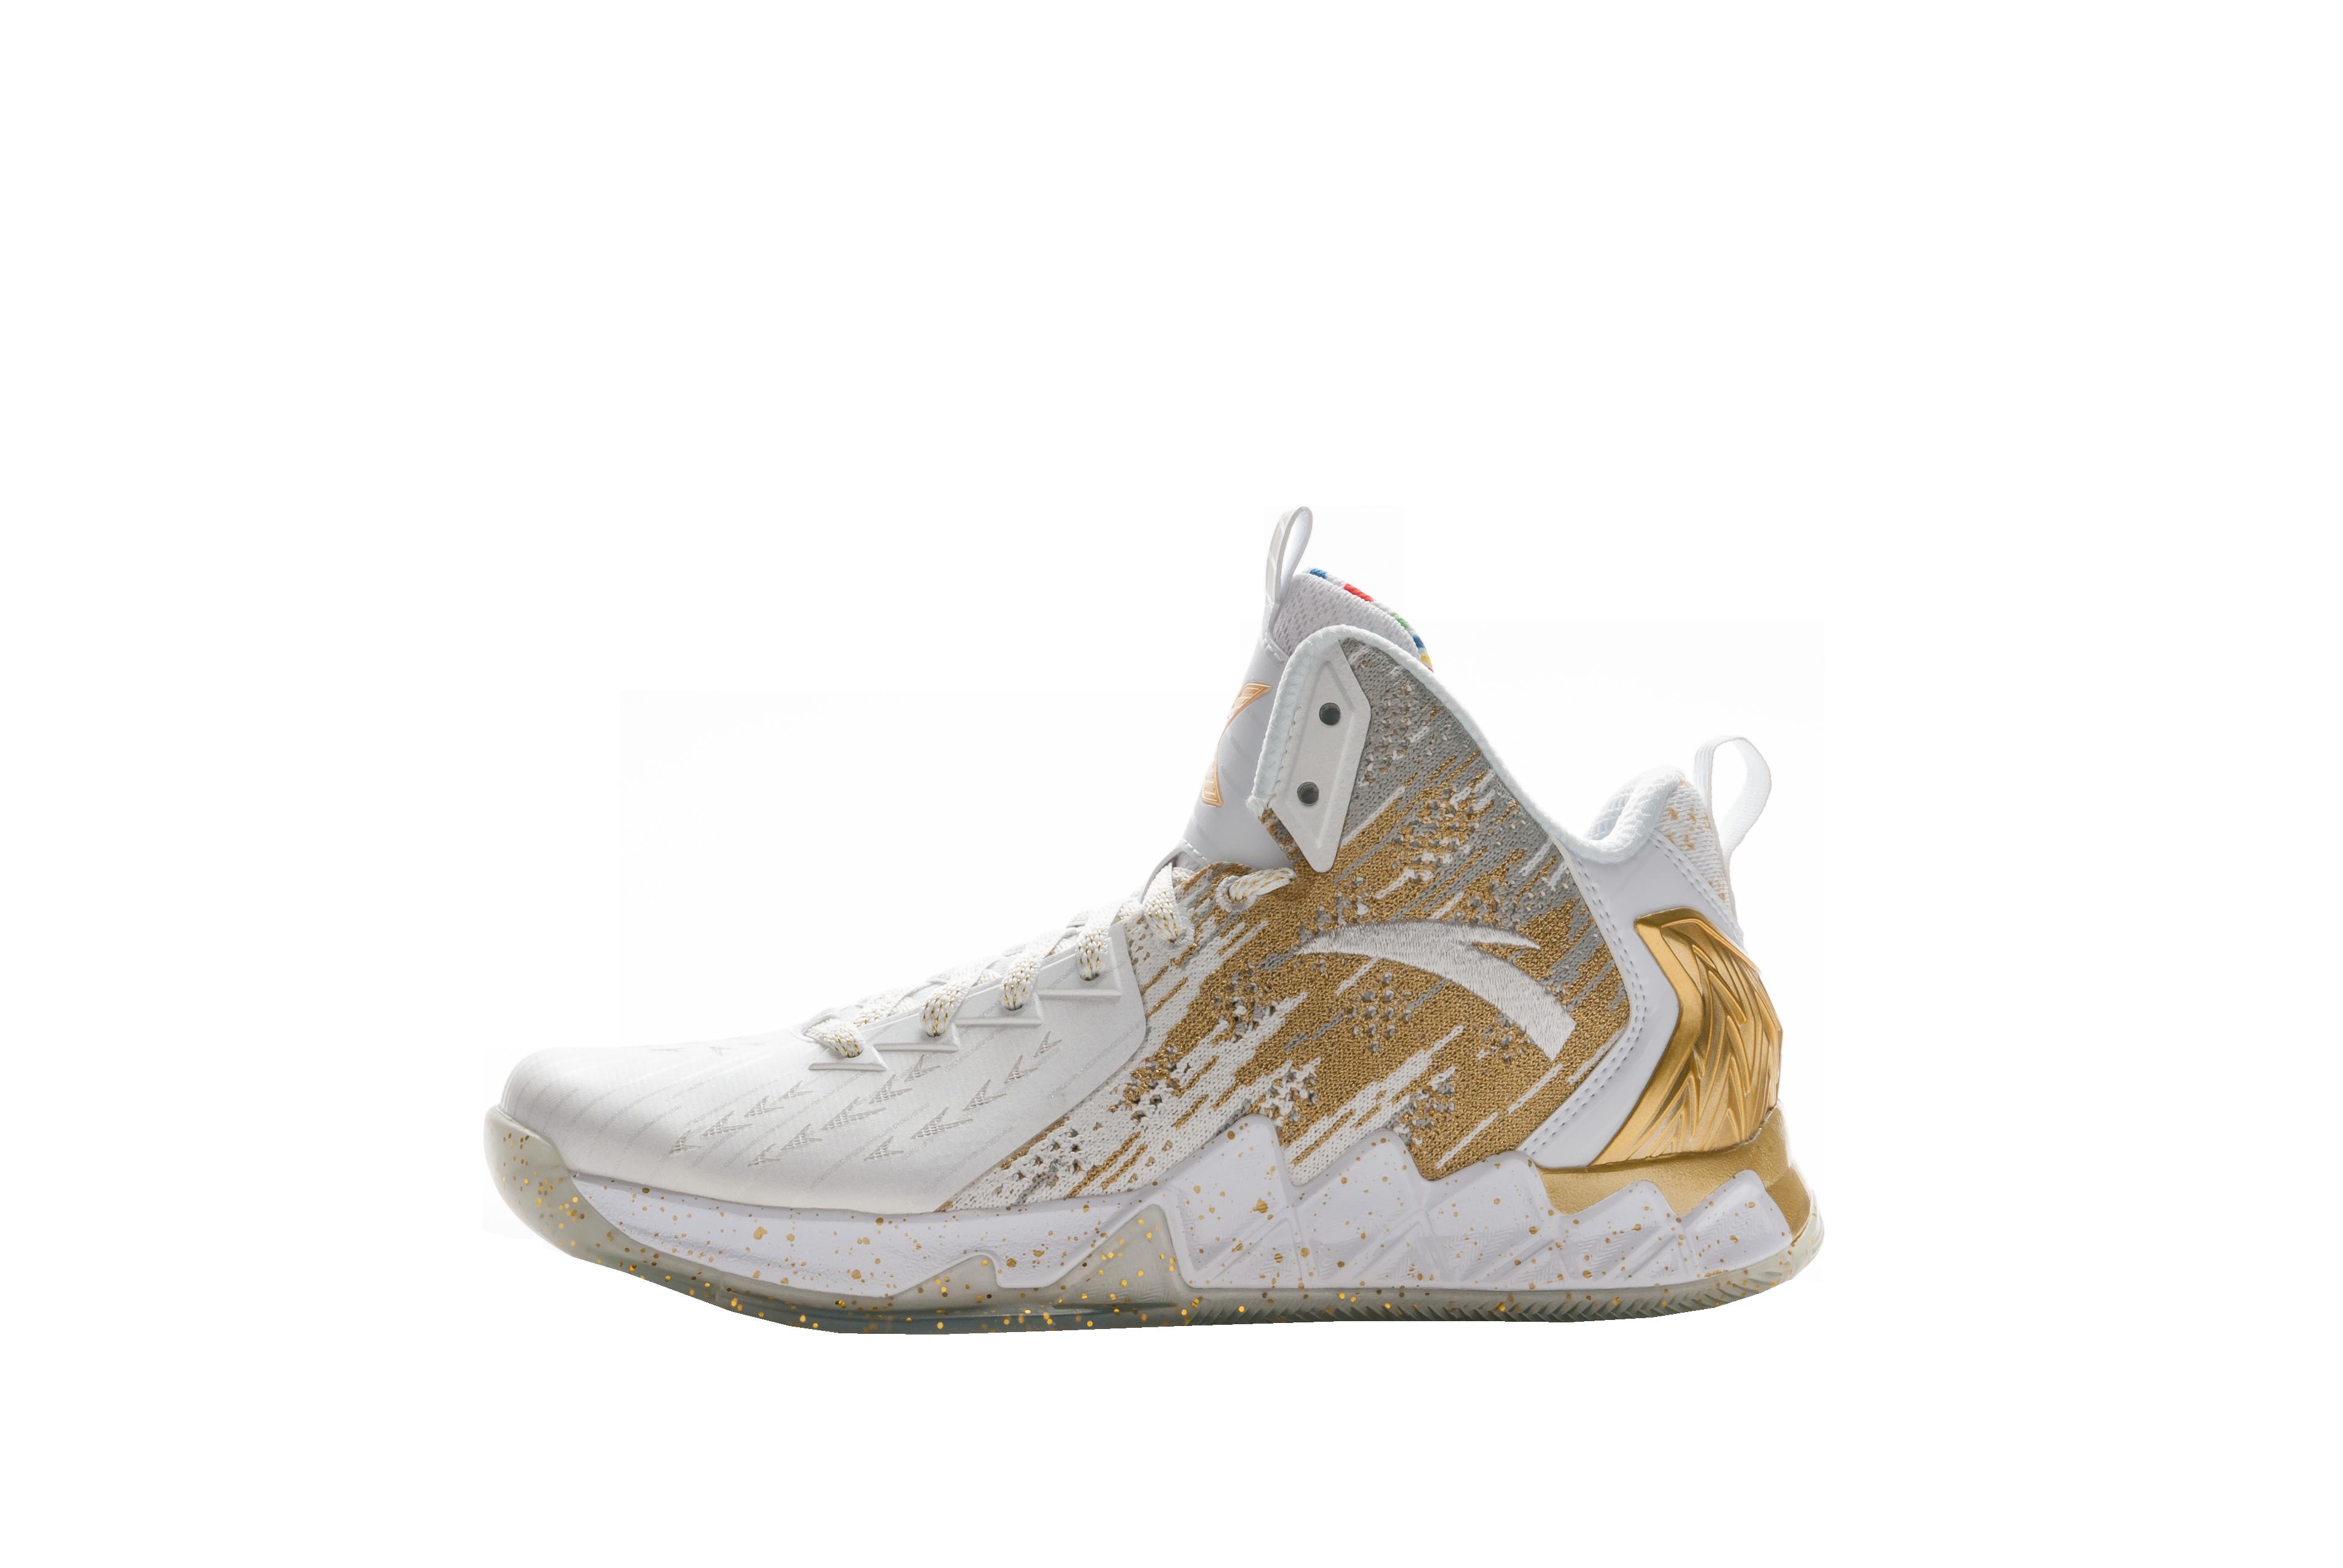 36b522de40b NBA playoffs 2017  Klay Thompson drops ANTA KT2  The Chase  sneakers ...